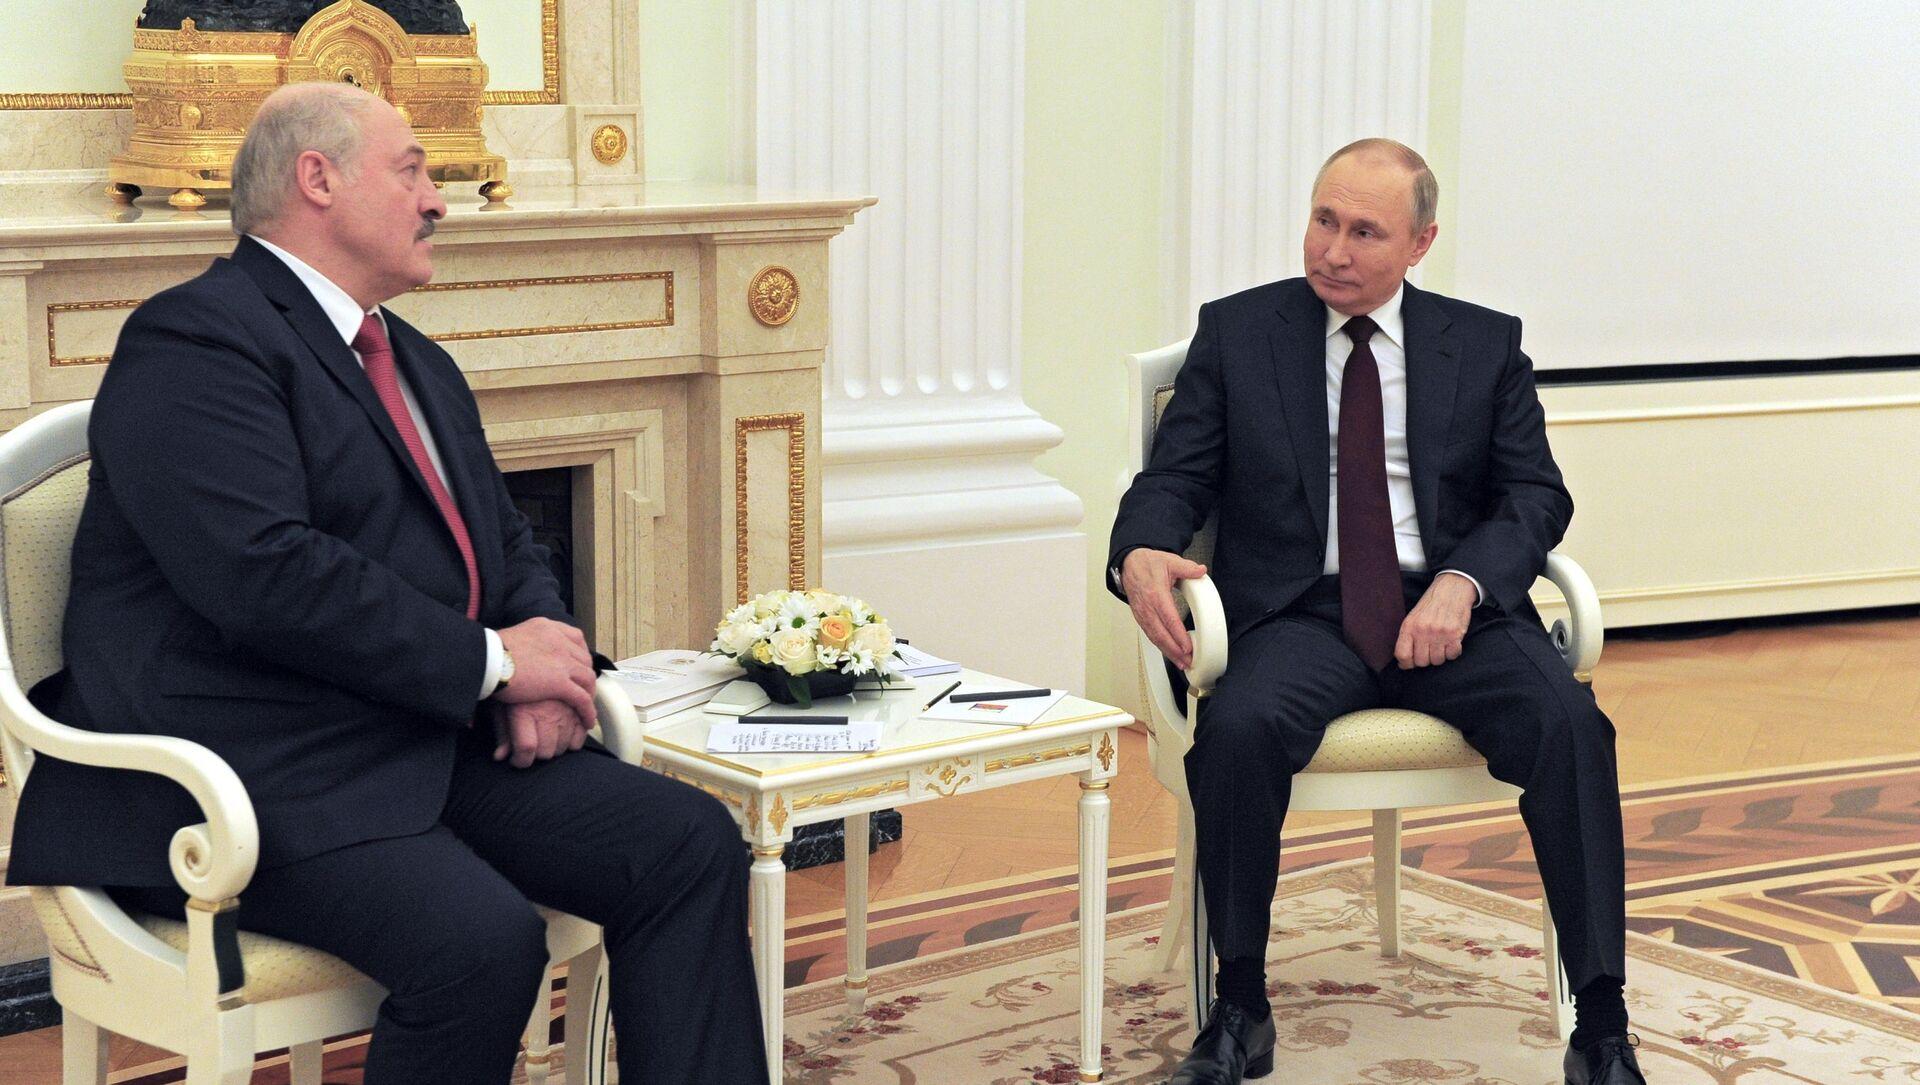 Президент РФ Владимир Путин и президент Белоруссии Александр Лукашенко (справа) во время встречи - Sputnik Азербайджан, 1920, 23.08.2021